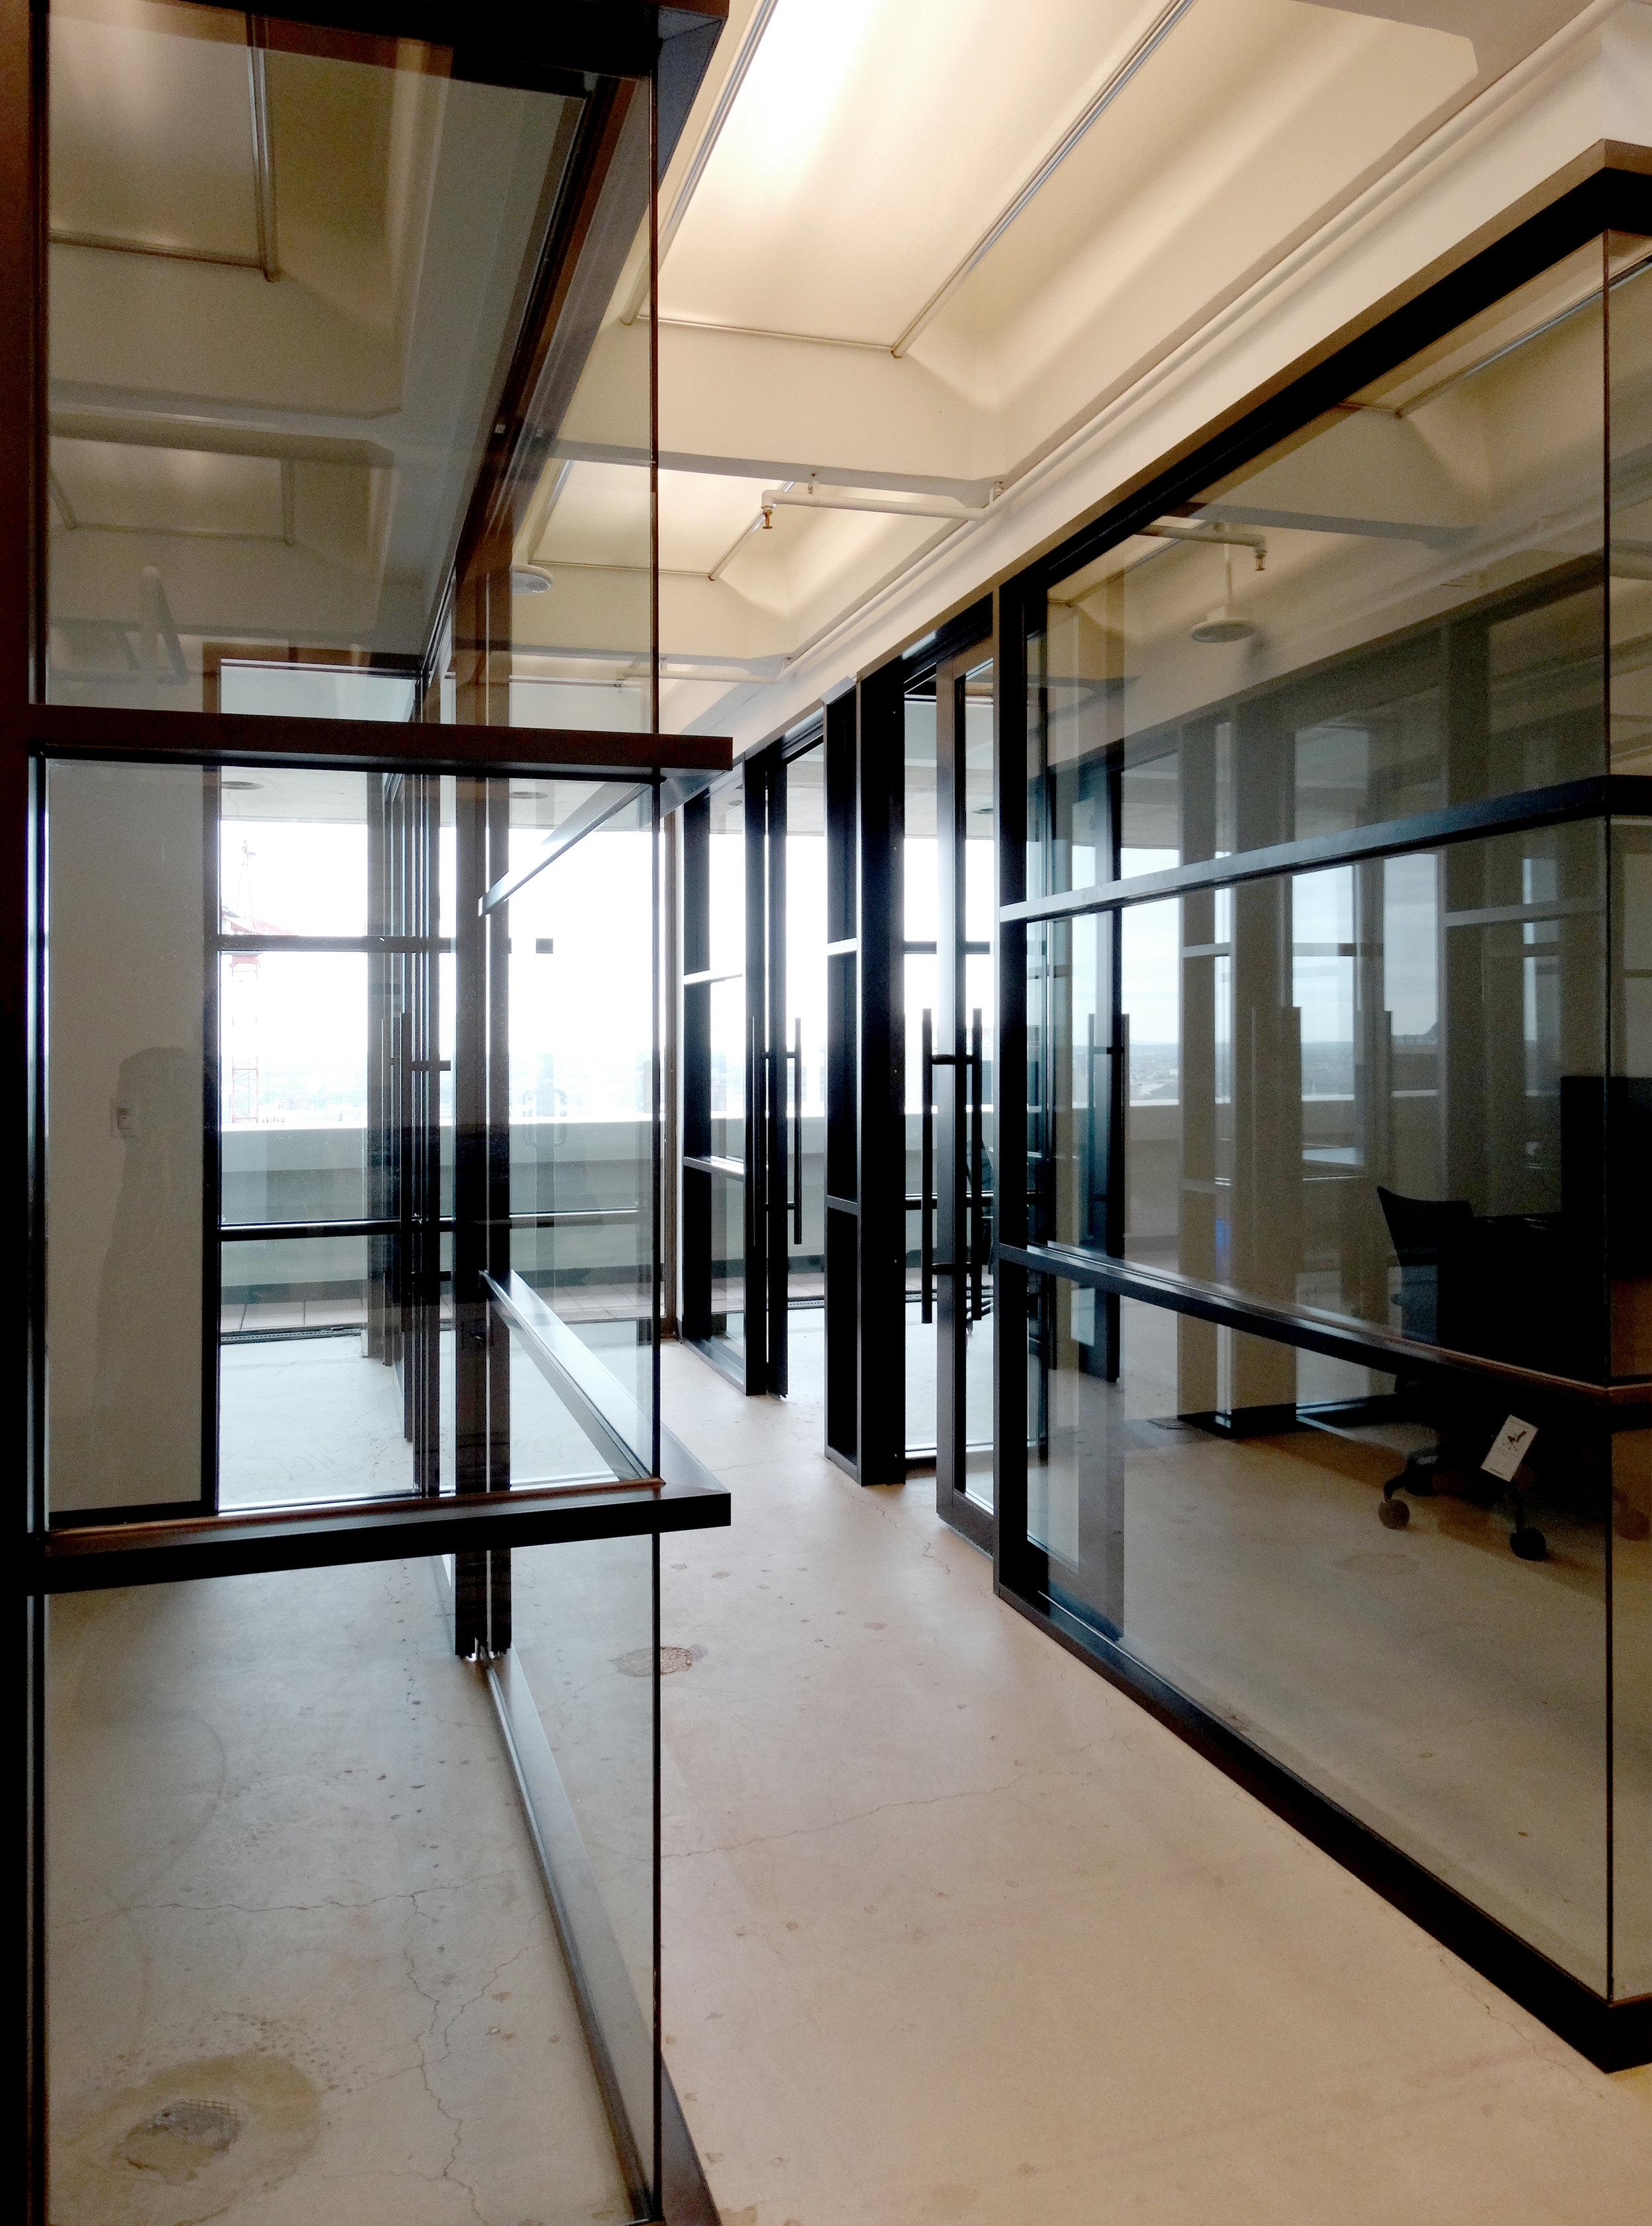 Encase Black Aluminum Horizontal Mullion Glass Wall - Spaceworks AI.JPG